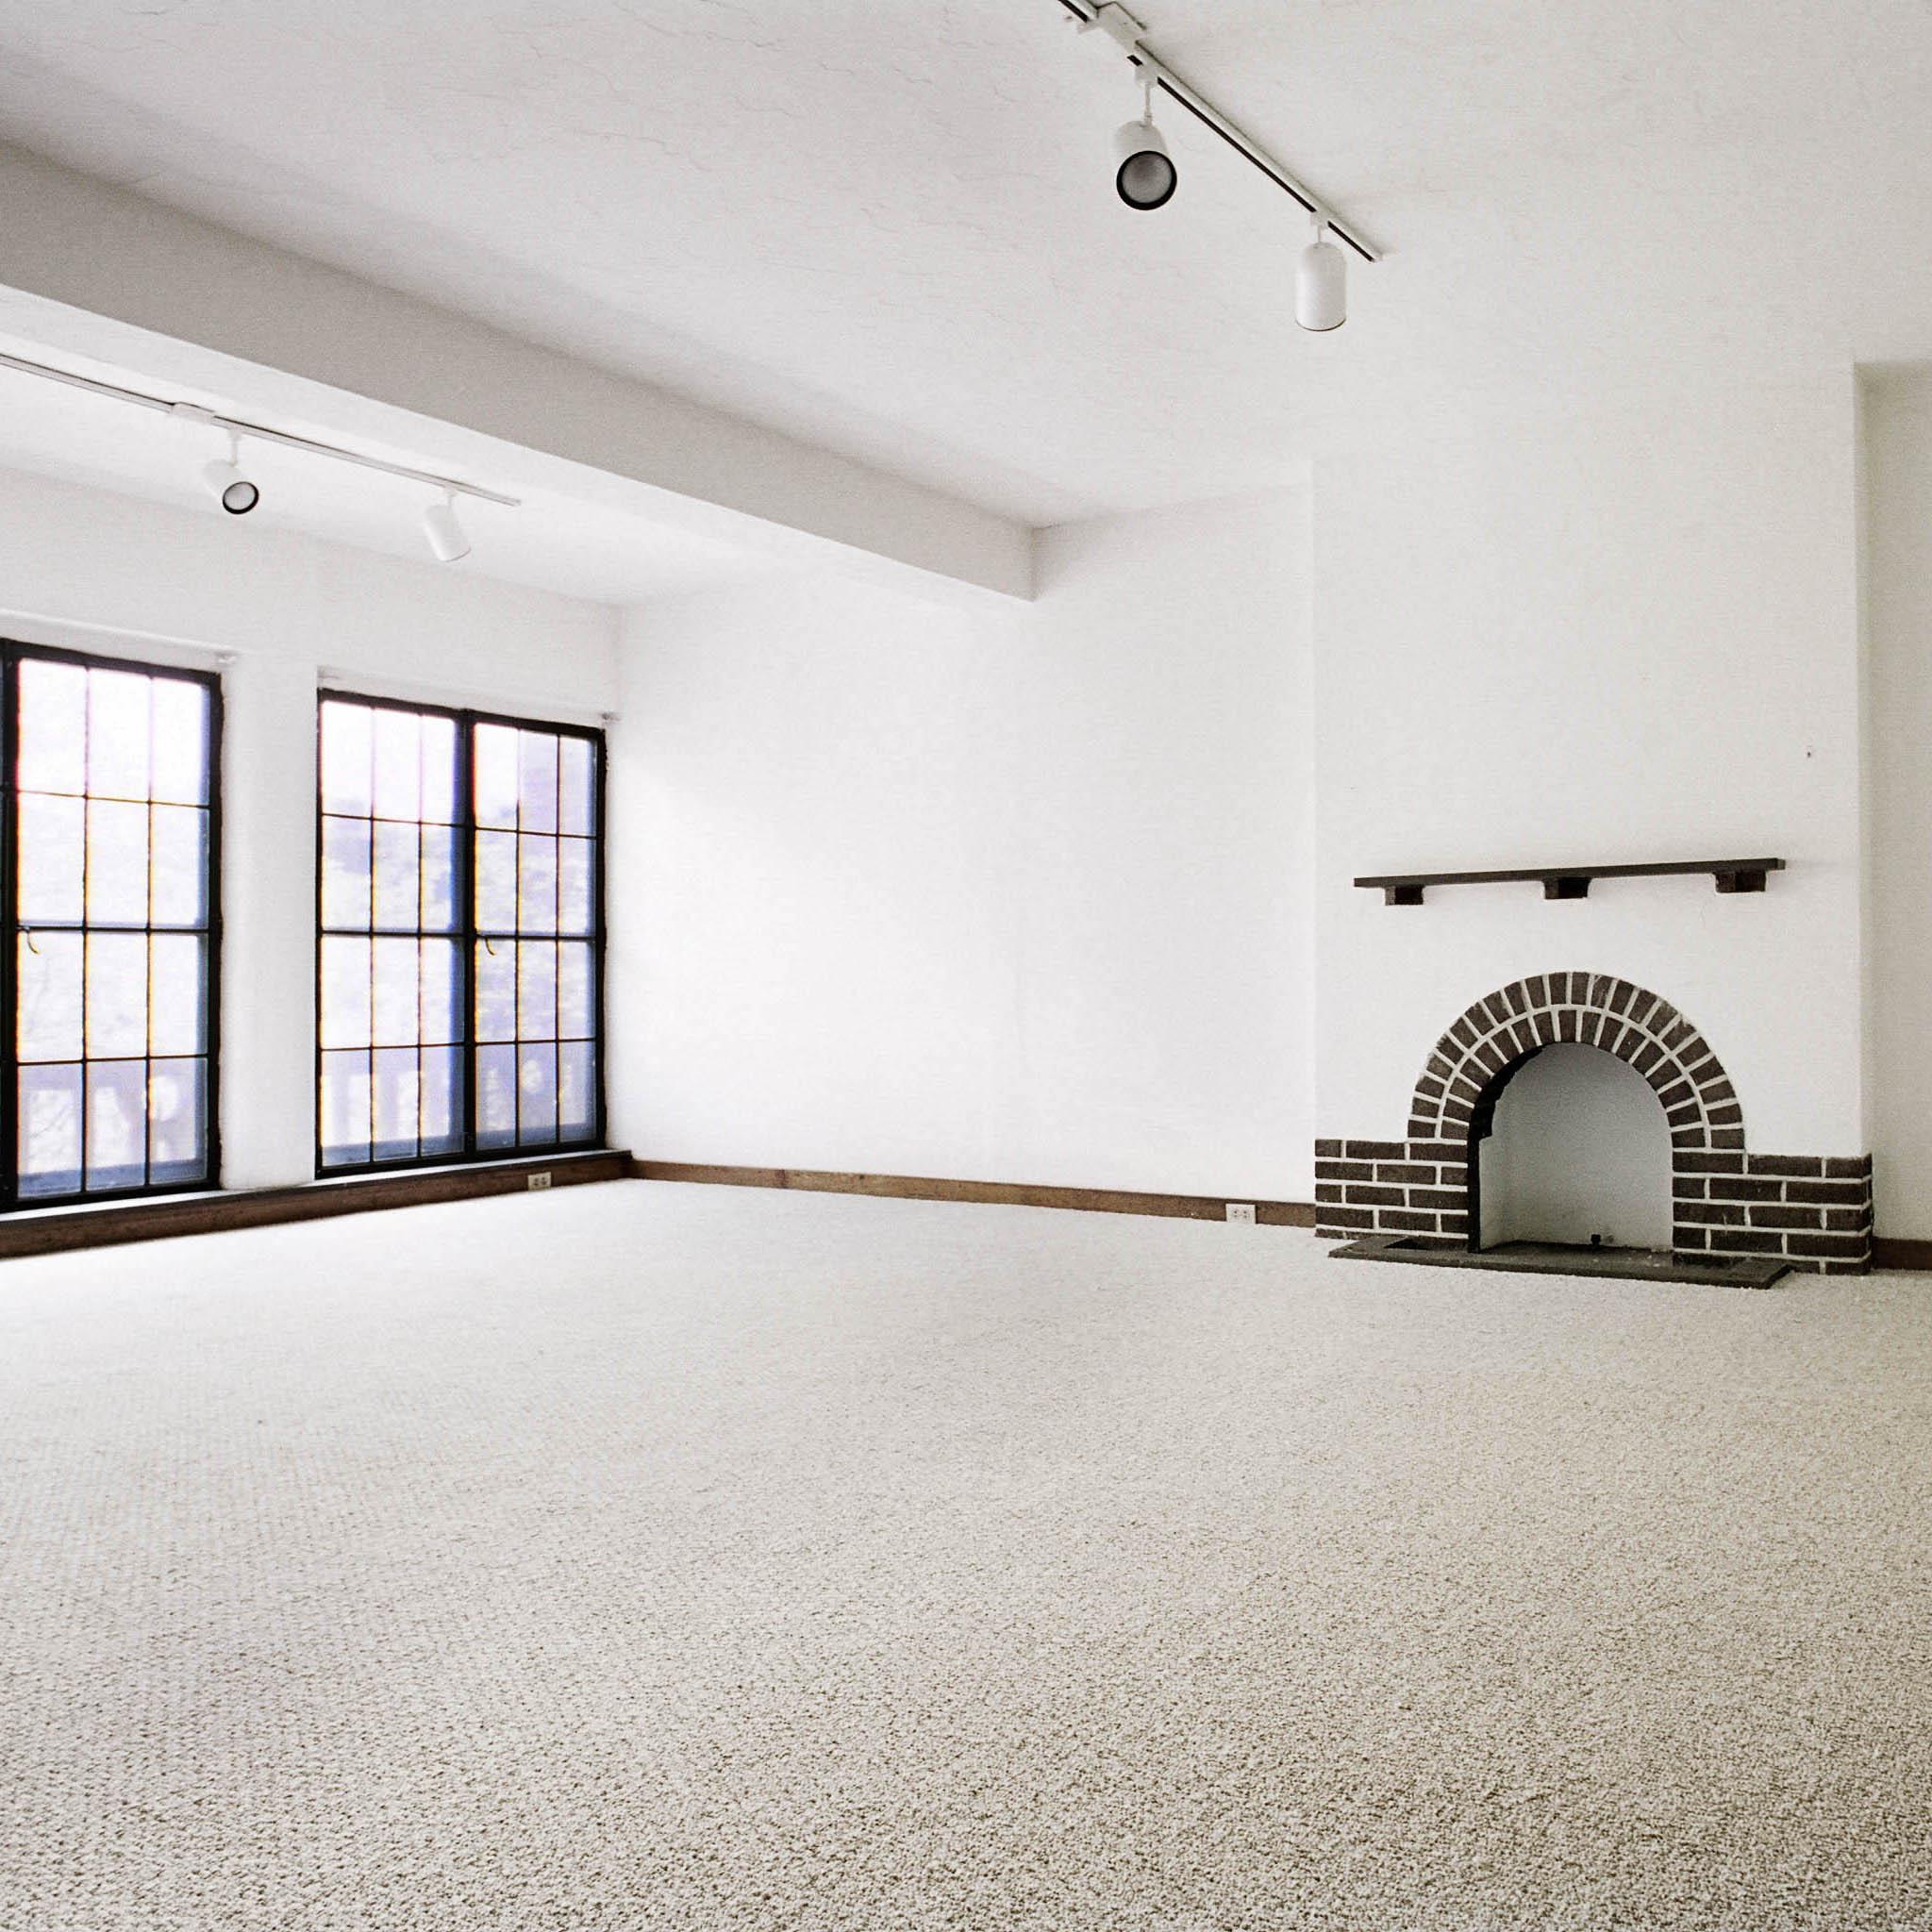 interior of 340 S. Highland Ave, Apt. 8A 1